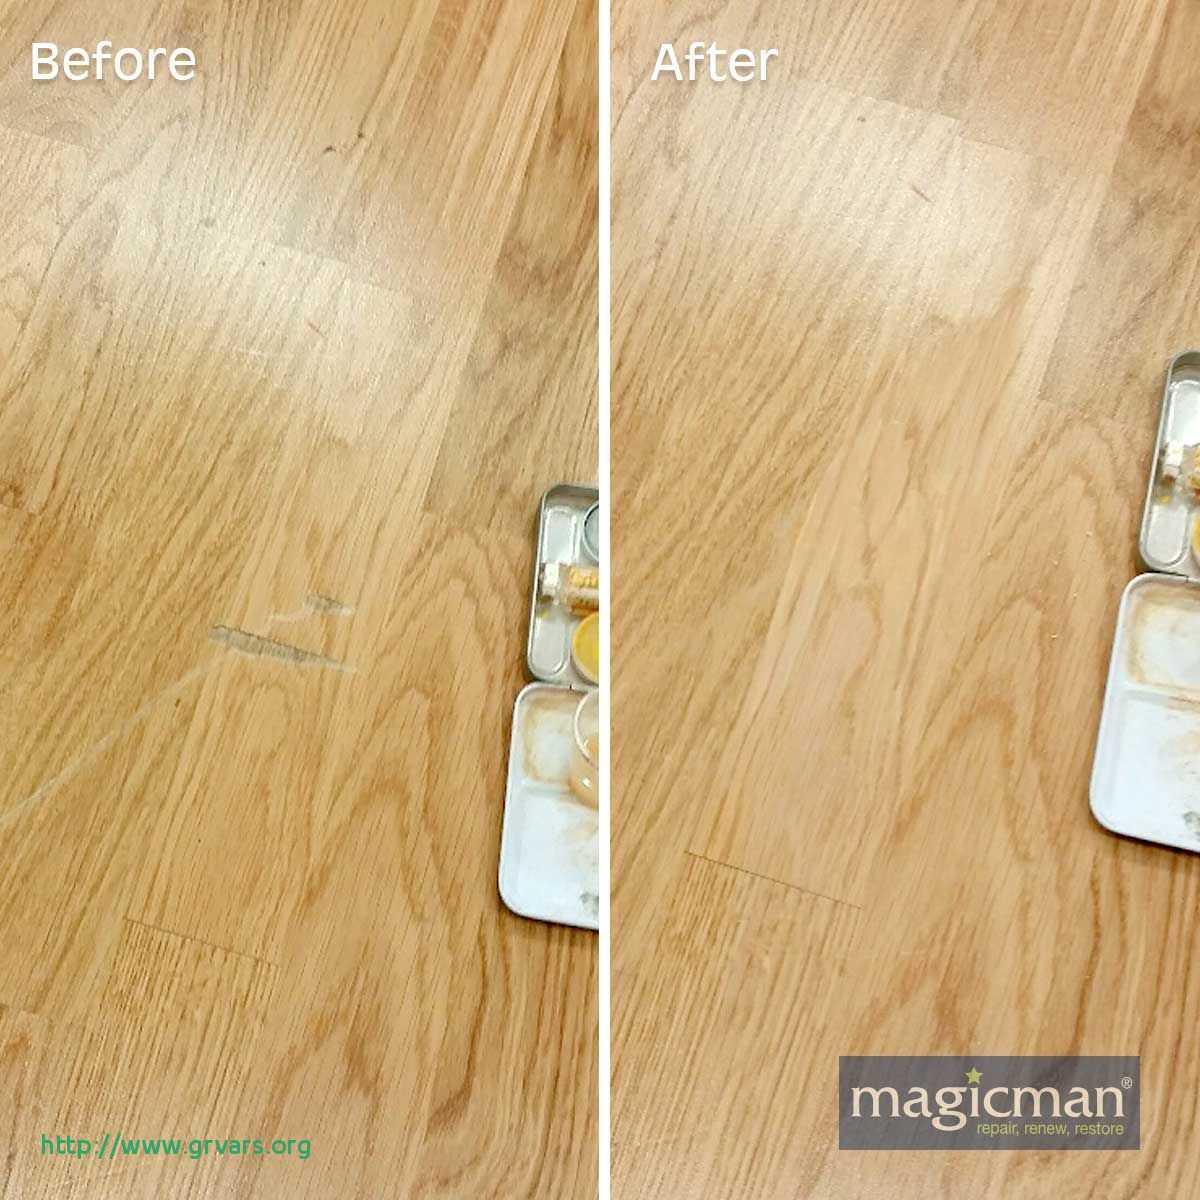 hardwood floor repair near me of wood floor gouge repair impressionnant atlantis prestige 5 1 6 for wood floor gouge repair frais deep gouge and scratch to wood flooring repaired with colour and